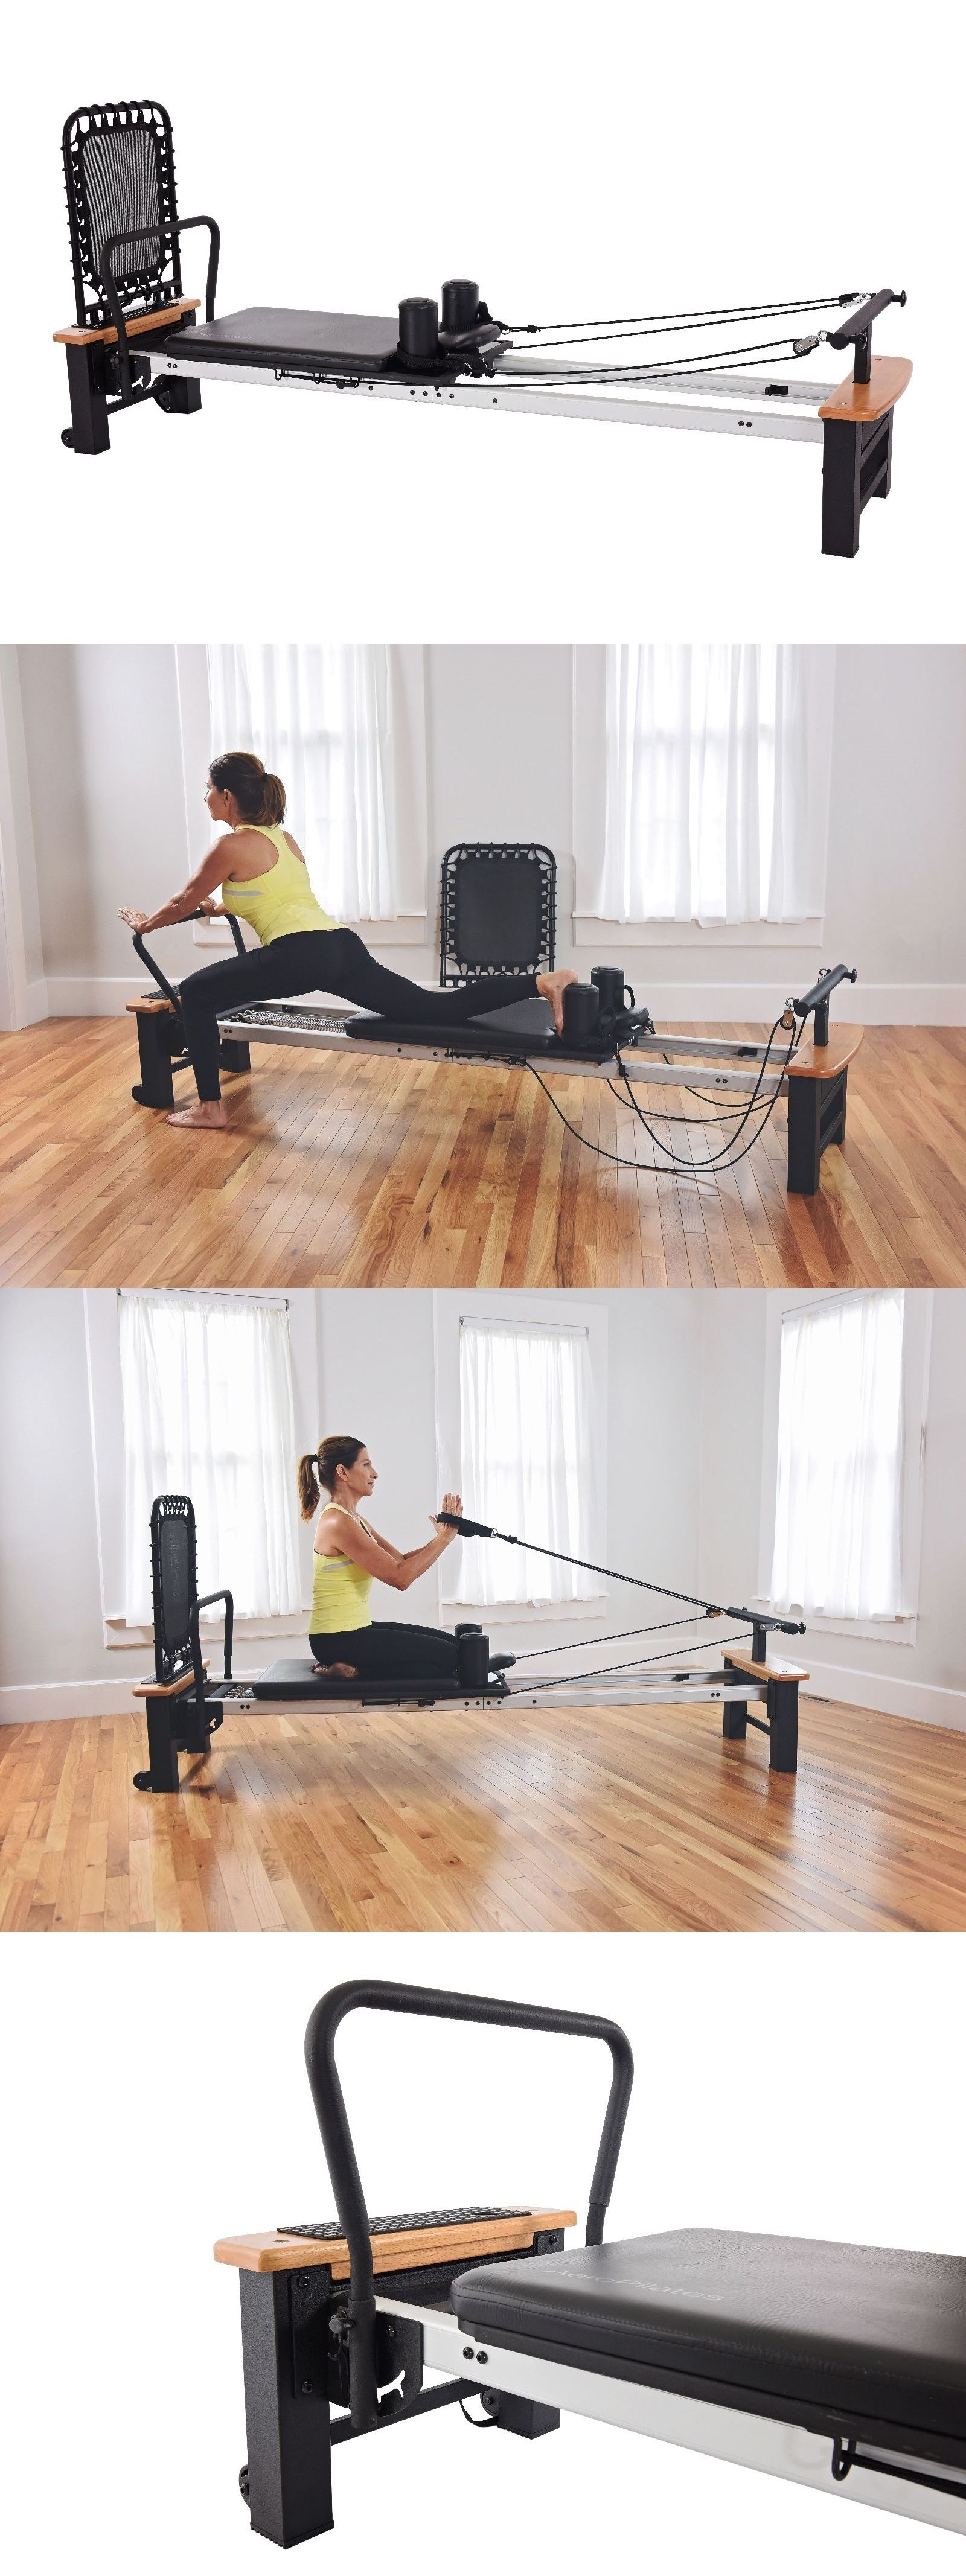 Pilates malibu chair buy malibu chair pilates combo - Pilates Tables 179807 Stamina Deluxe 55 5565 Aeropilates 565 Pro Series Pilates Exercise